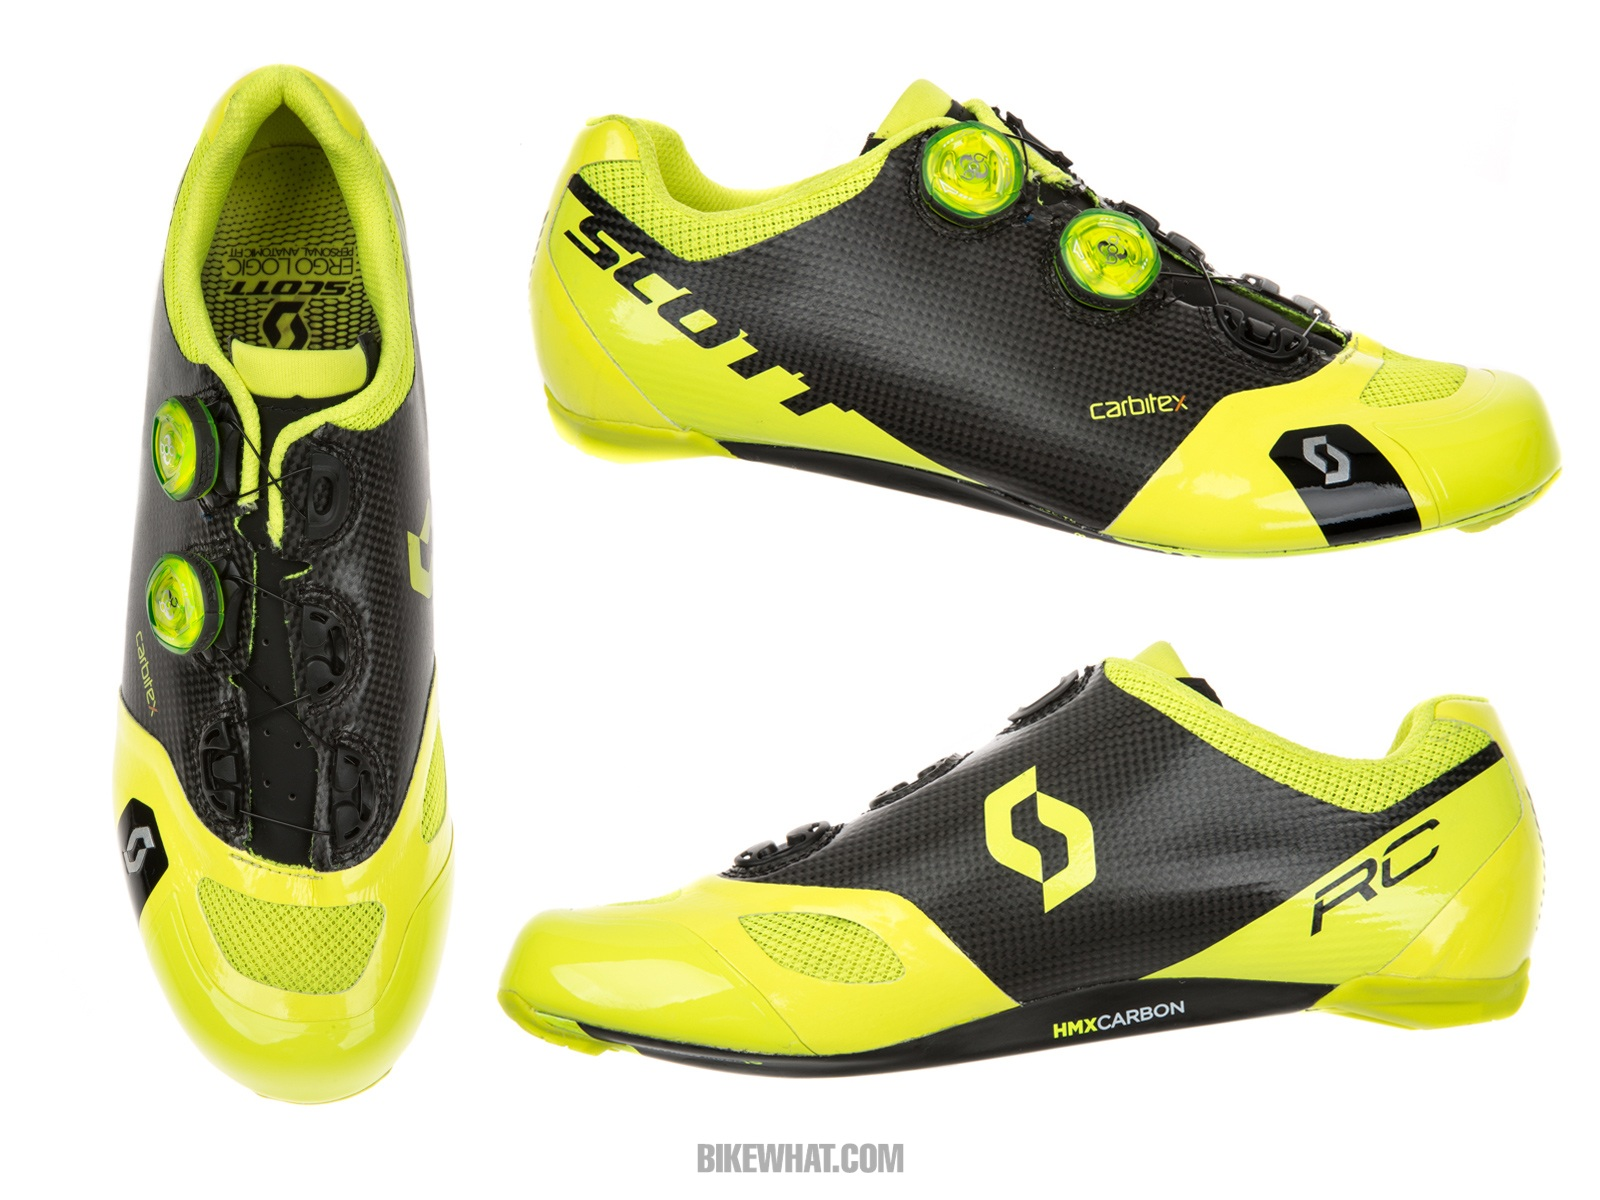 Scott_Shoes_14.jpg